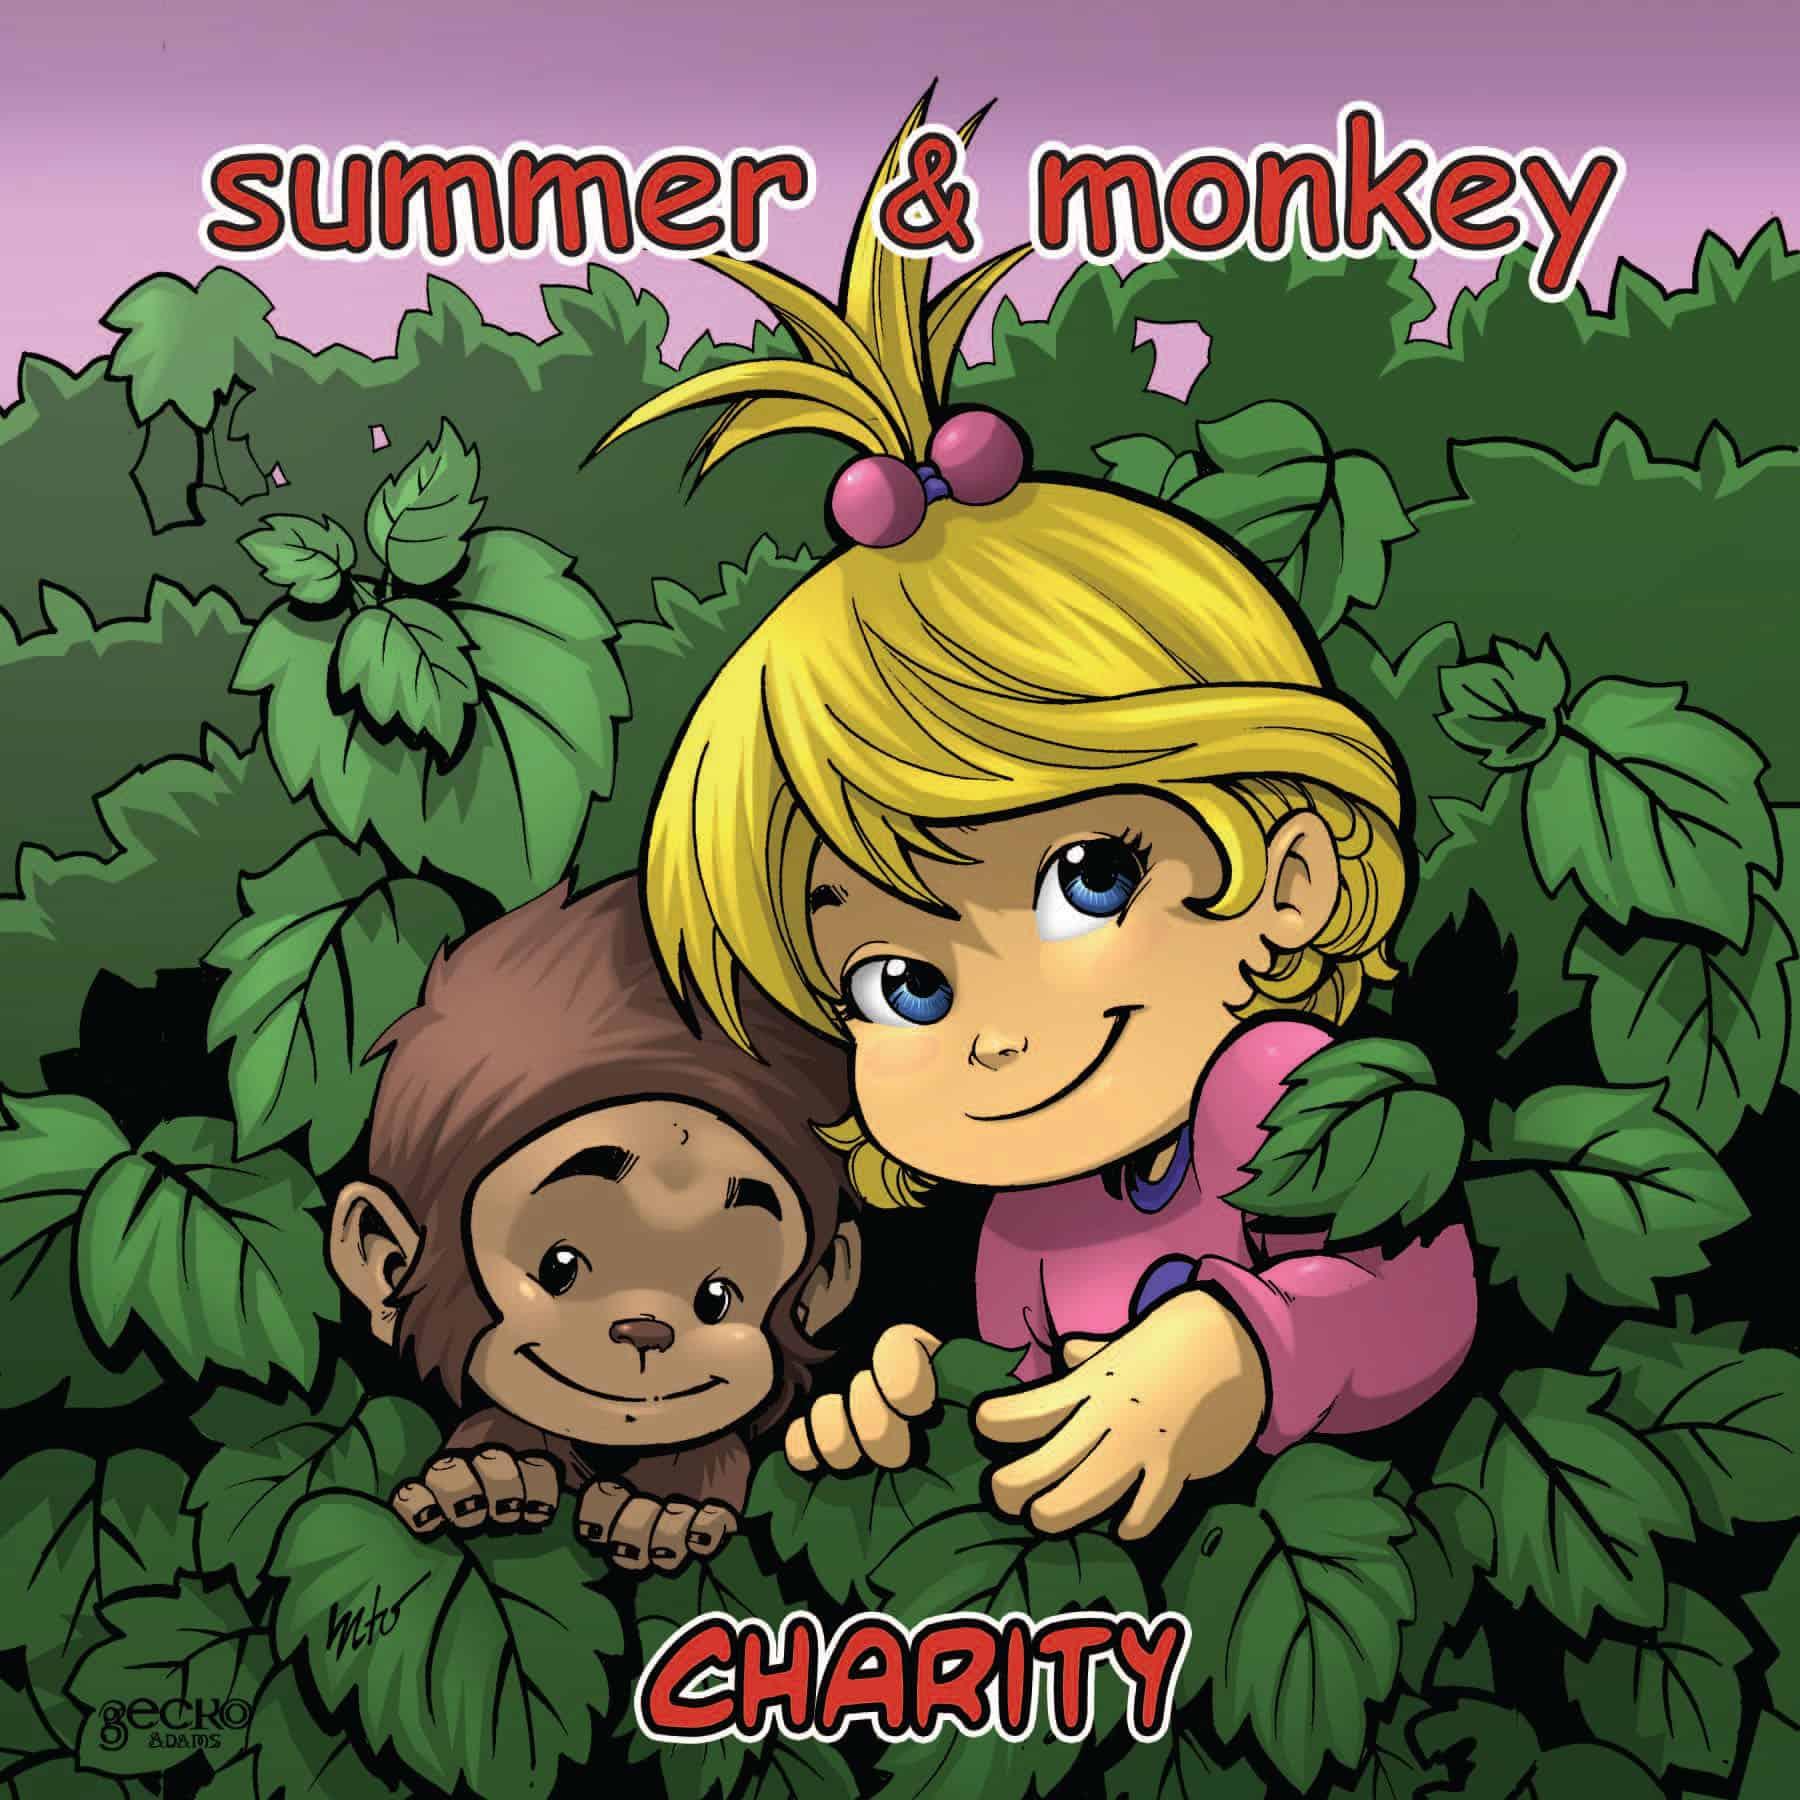 Summer_Charity-300dpi-1